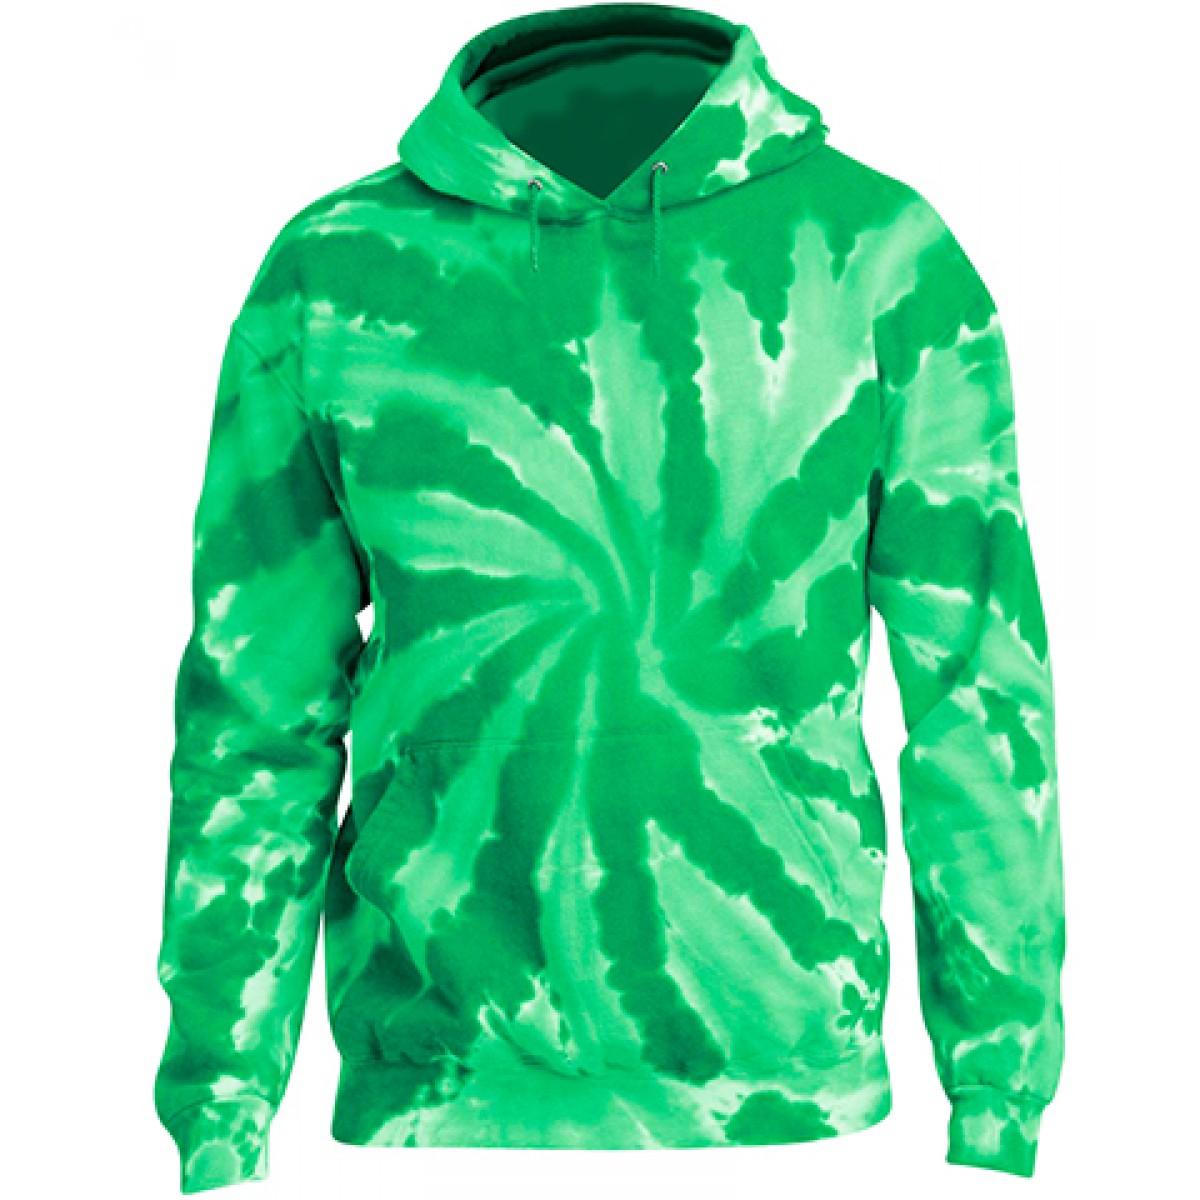 Tie-Dye Pullover Hooded Sweatshirt-Green-YL